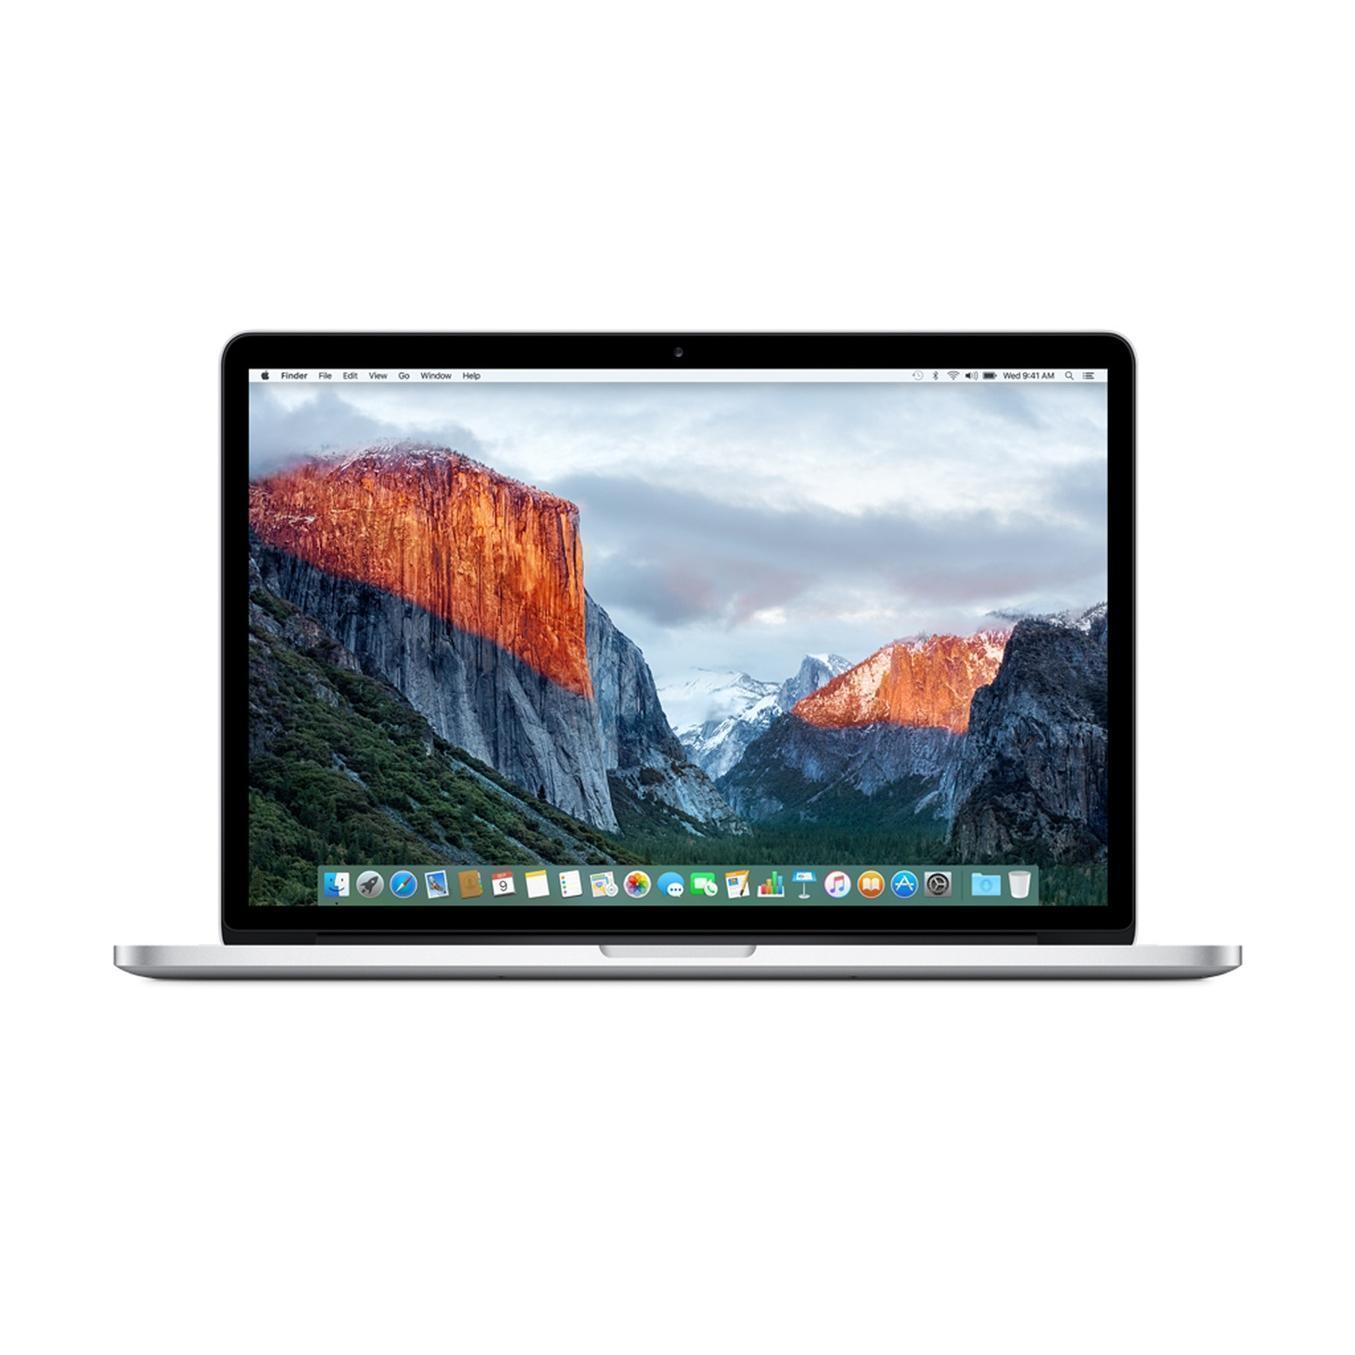 MacBook Pro Retina 15,4-tum (2012) - Core i7 - 16GB - SSD 128 GB QWERTY - Nederländska